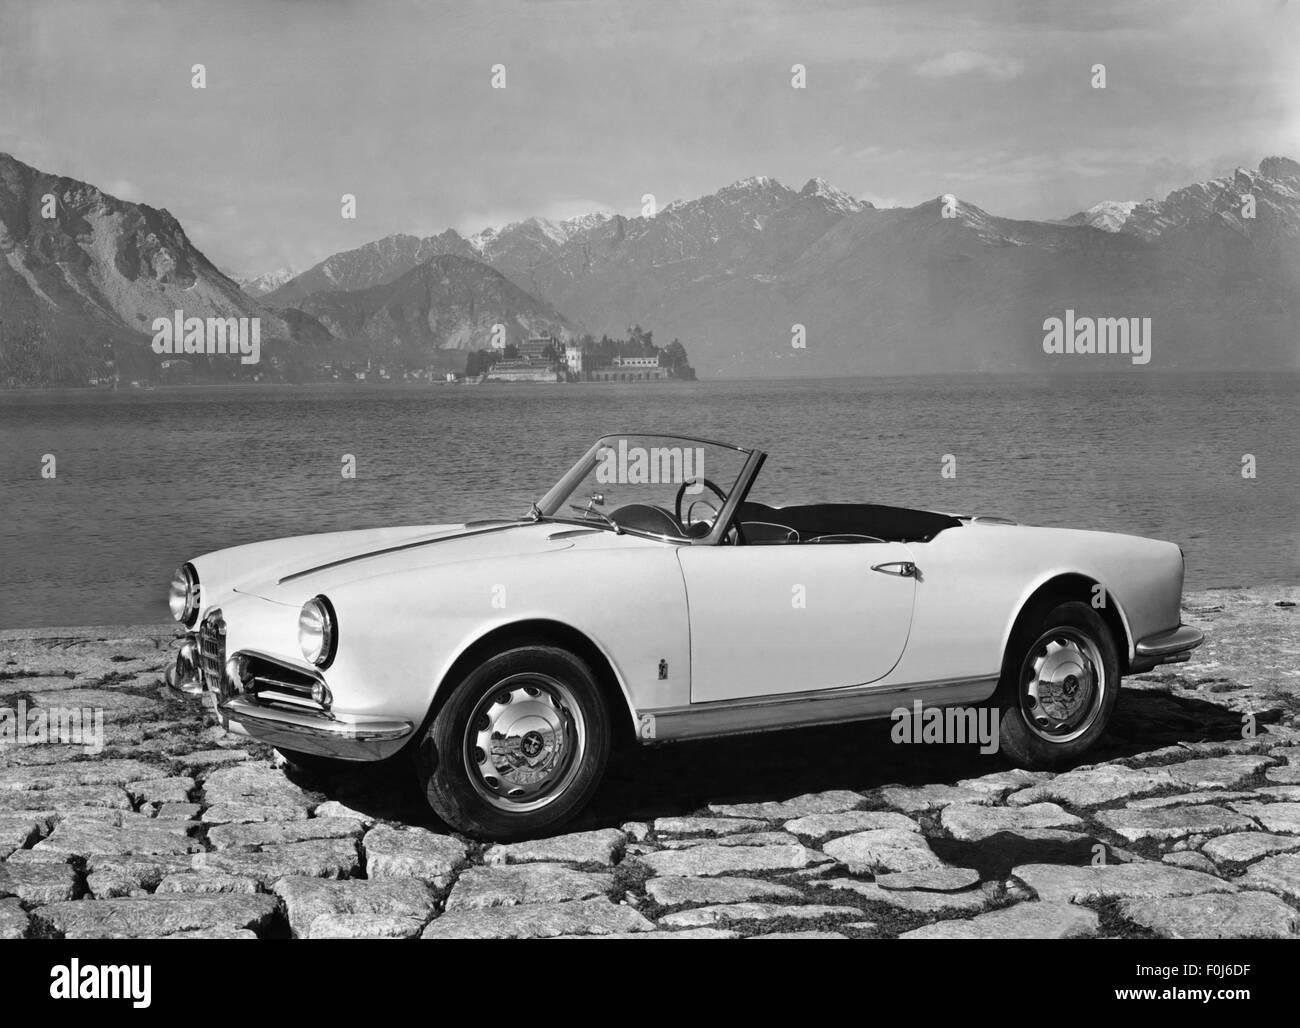 alfa romeo giulietta sprint cabrio 1950s stock photo royalty free image 86452059 alamy. Black Bedroom Furniture Sets. Home Design Ideas